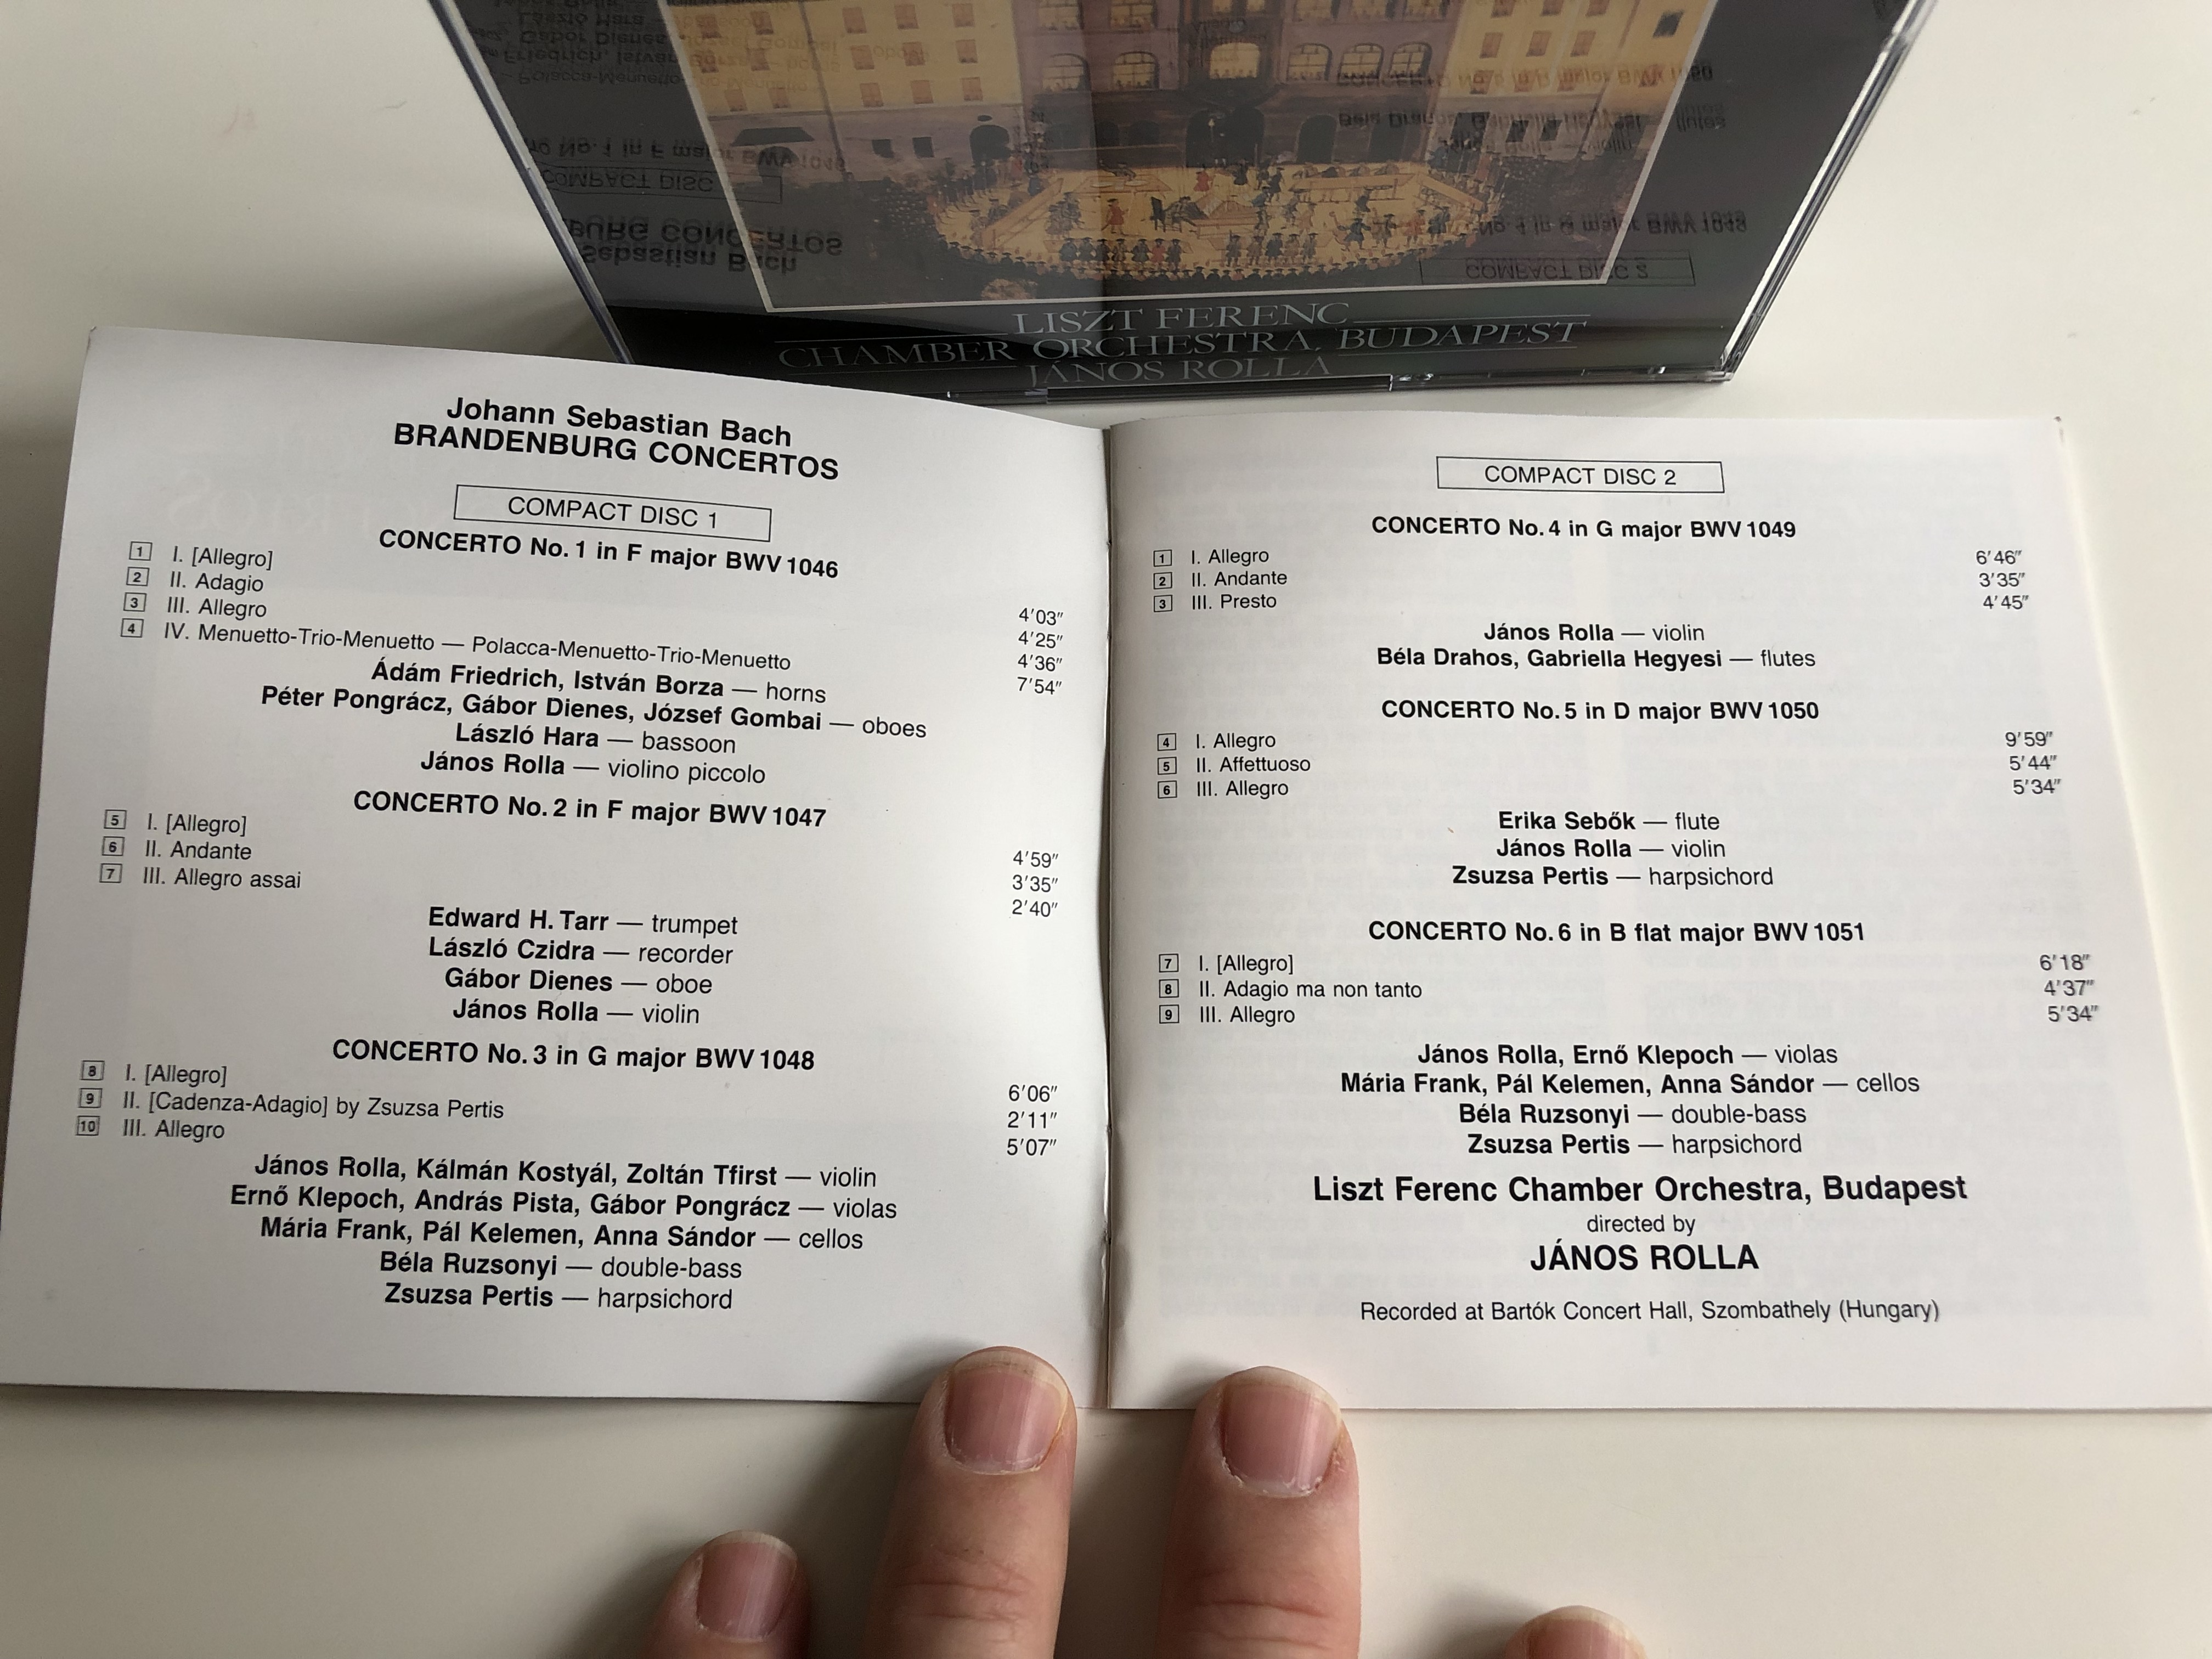 johann-sebastian-bach-brandenburg-concertos-2cd-liszt-ferenc-chamber-orchestra-conducted-by-j-nos-rolla-hungaroton-hcd-12618-19-6-.jpg